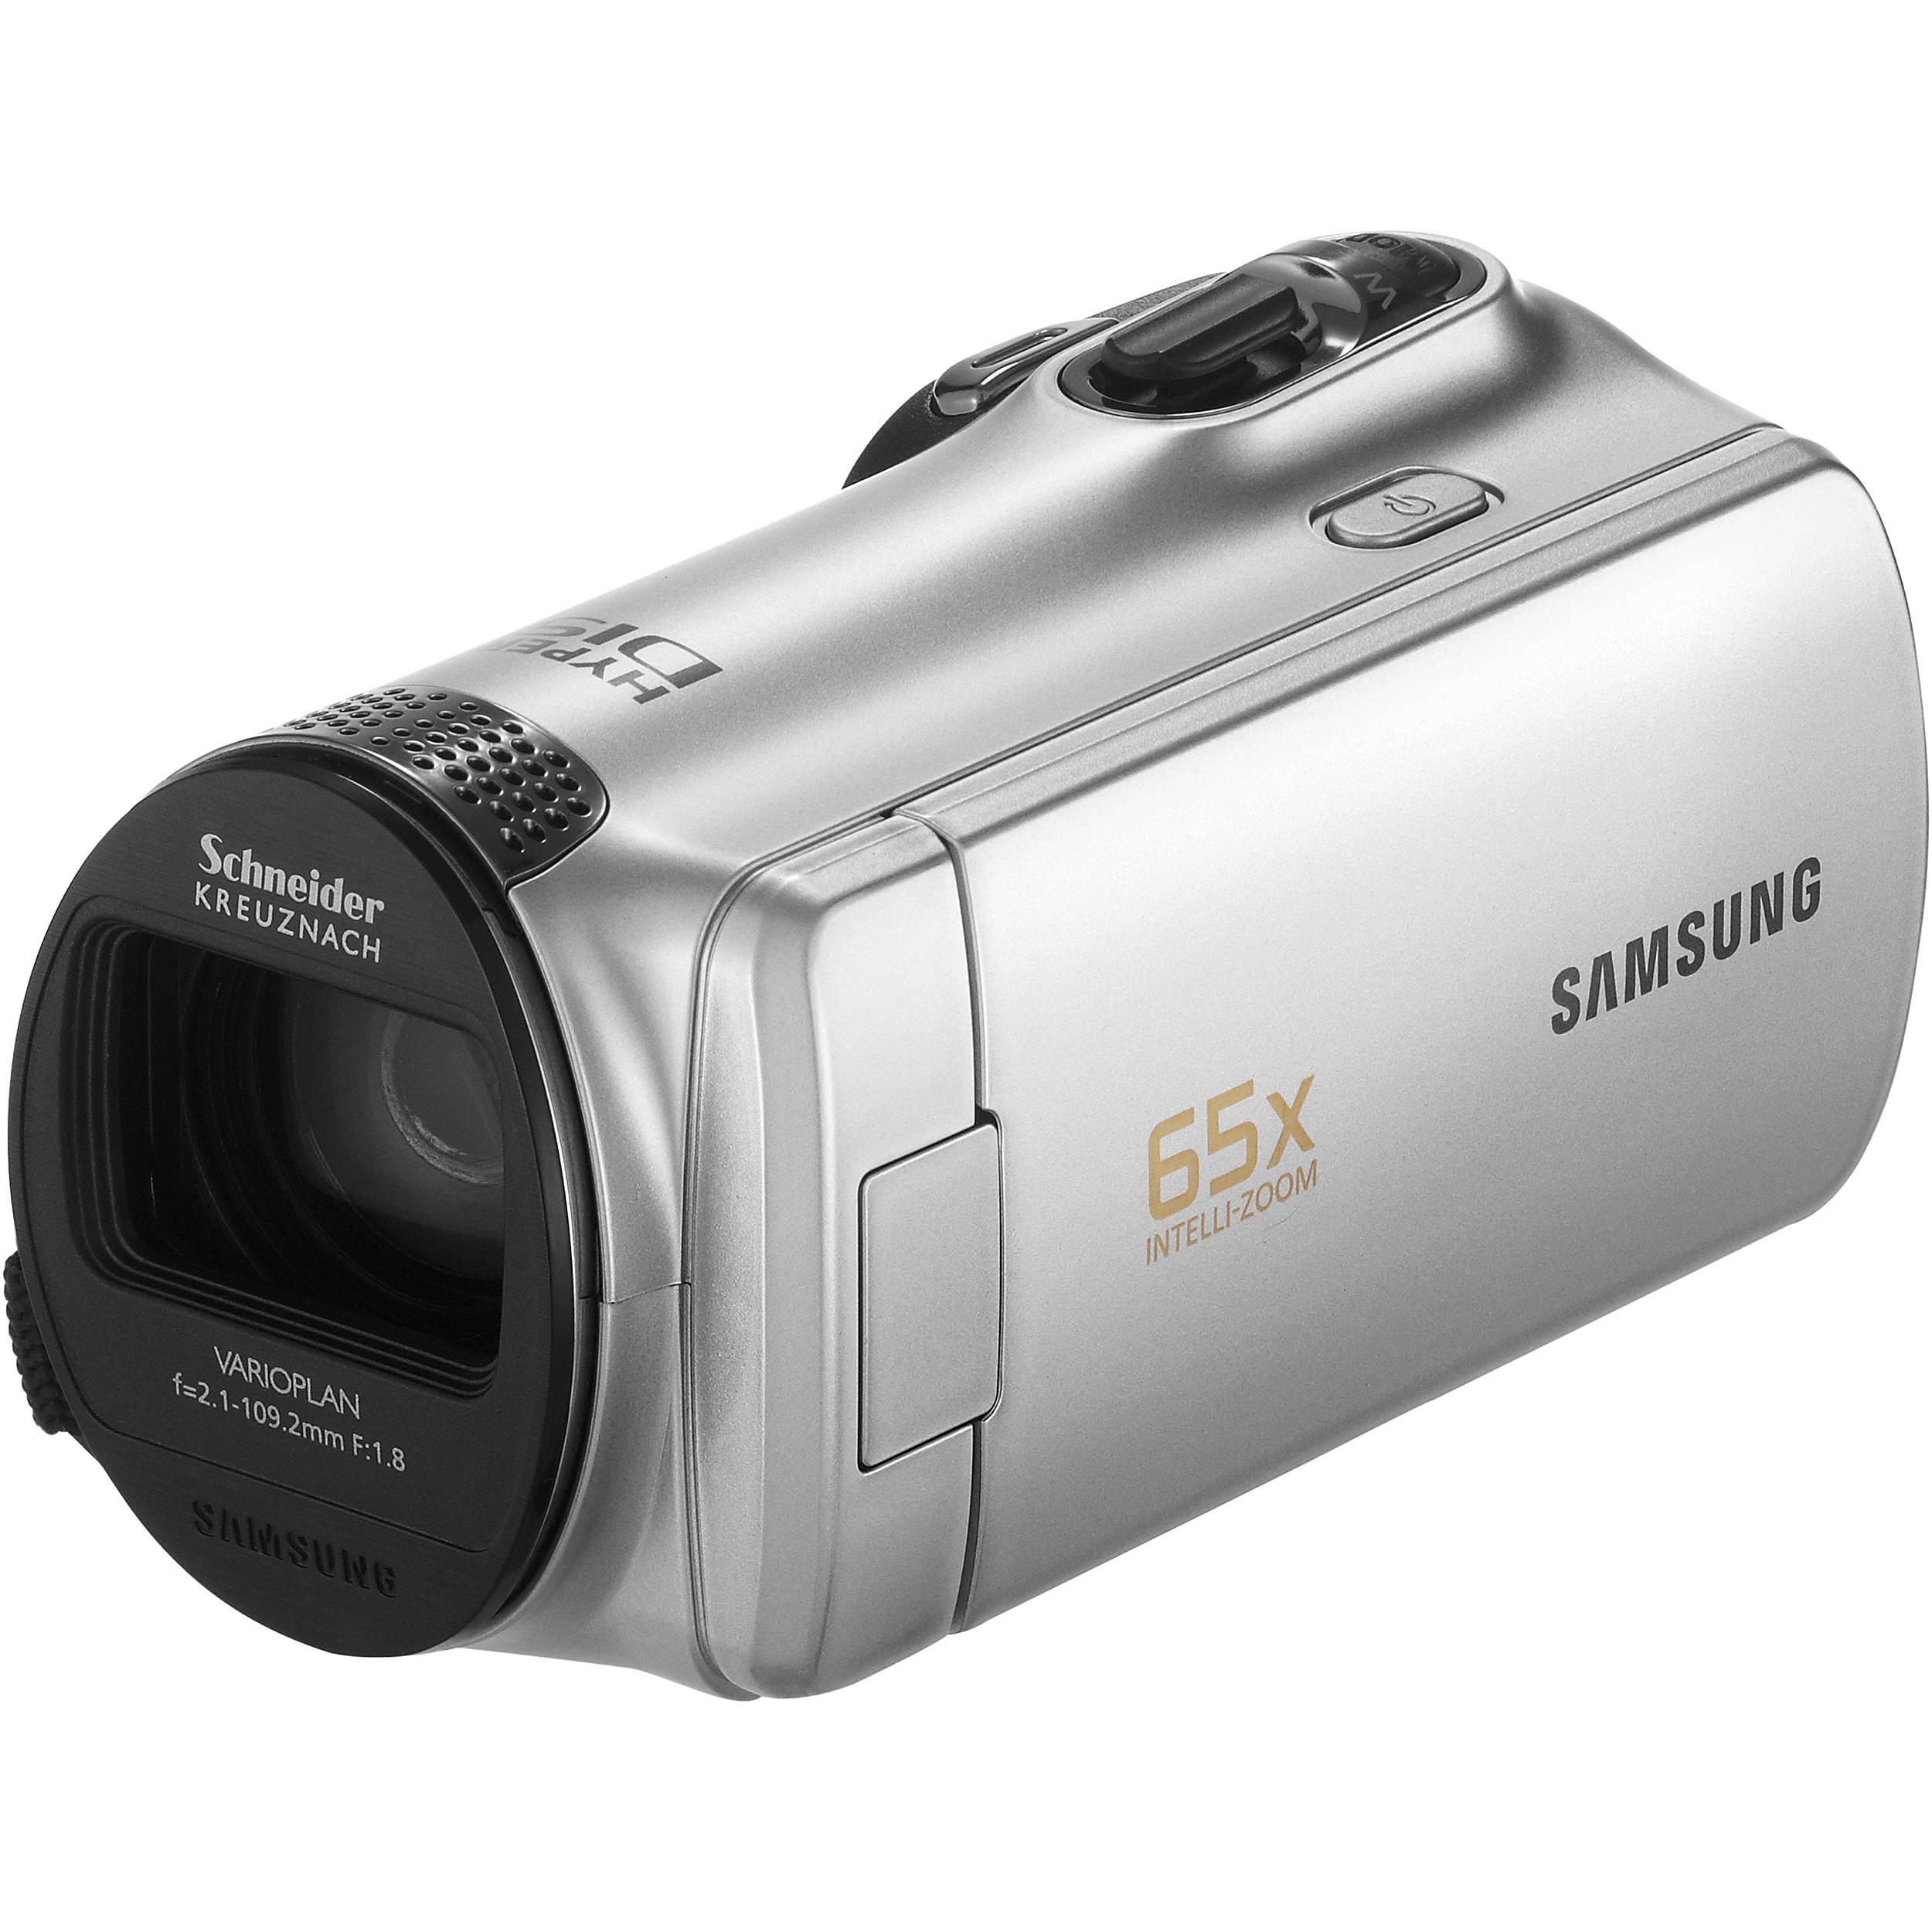 samsung smx f50 flash memory camcorder silver smx f50sn xaa rh bhphotovideo com Samsung 56X Camcorder Manual samsung 65x intelli zoom camcorder manual